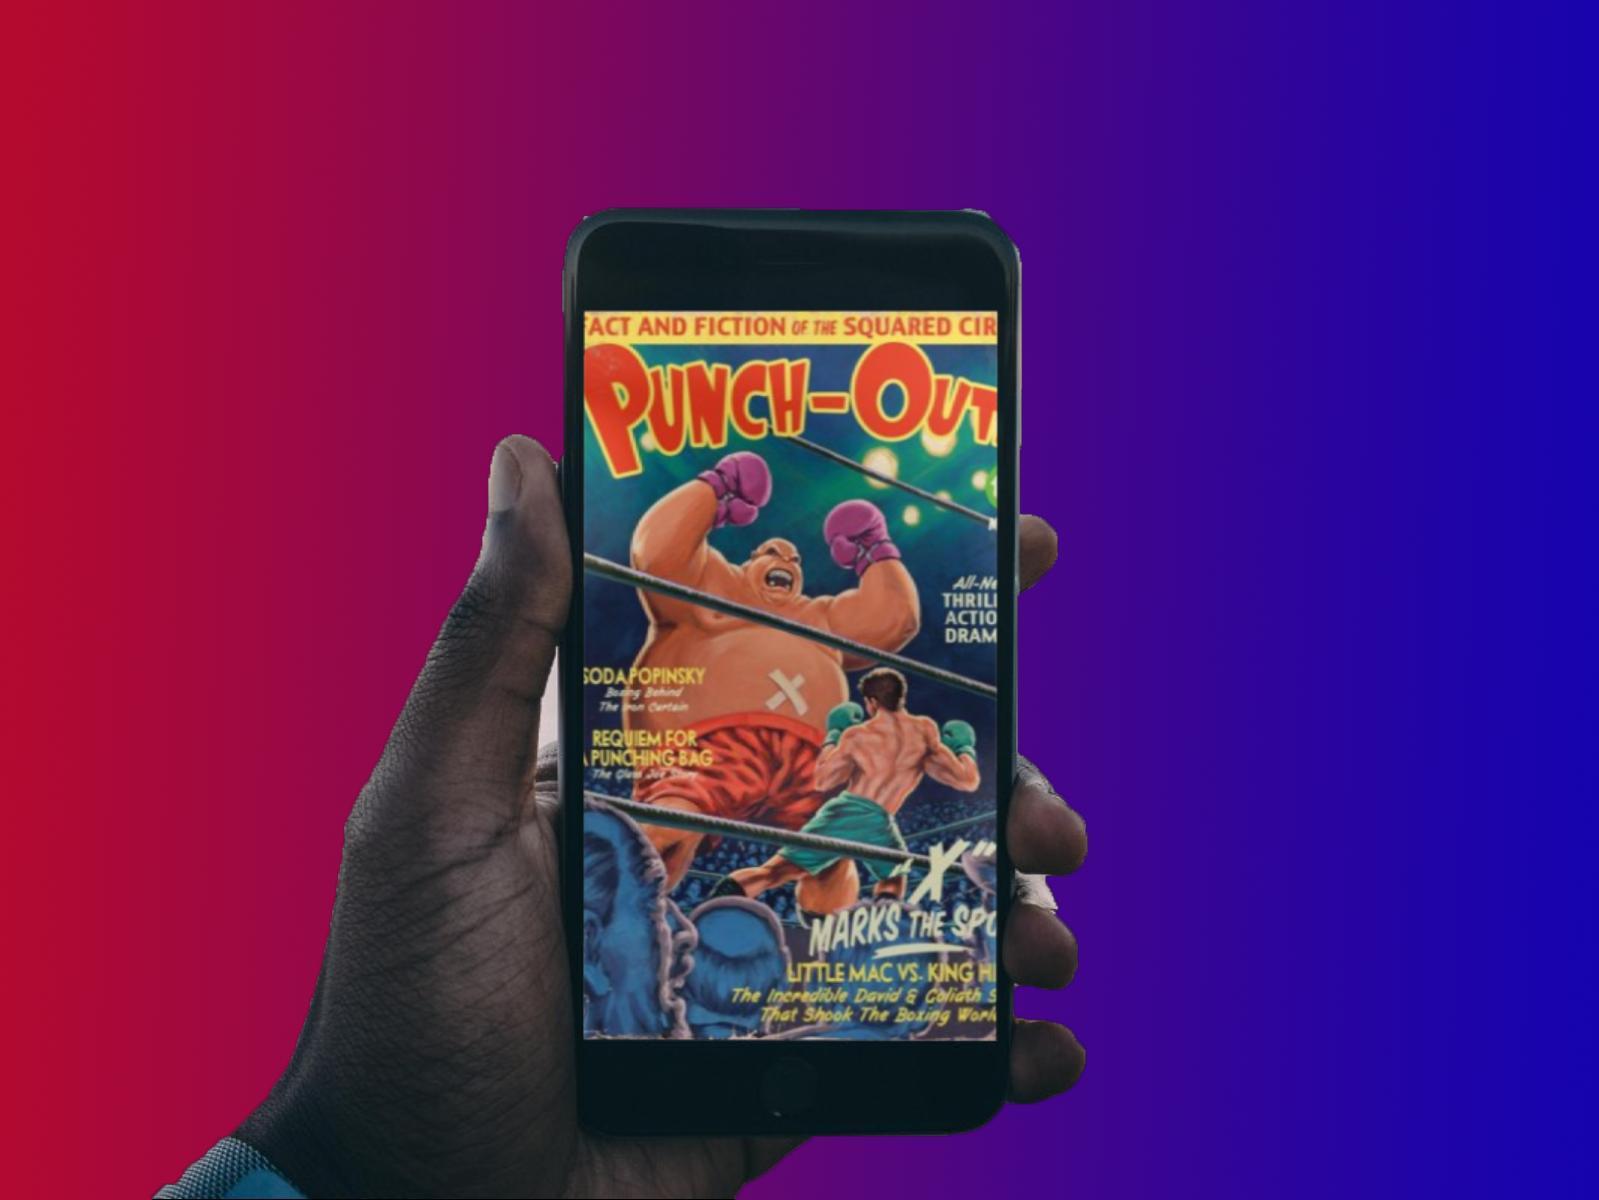 super nintendo emulator for android phone